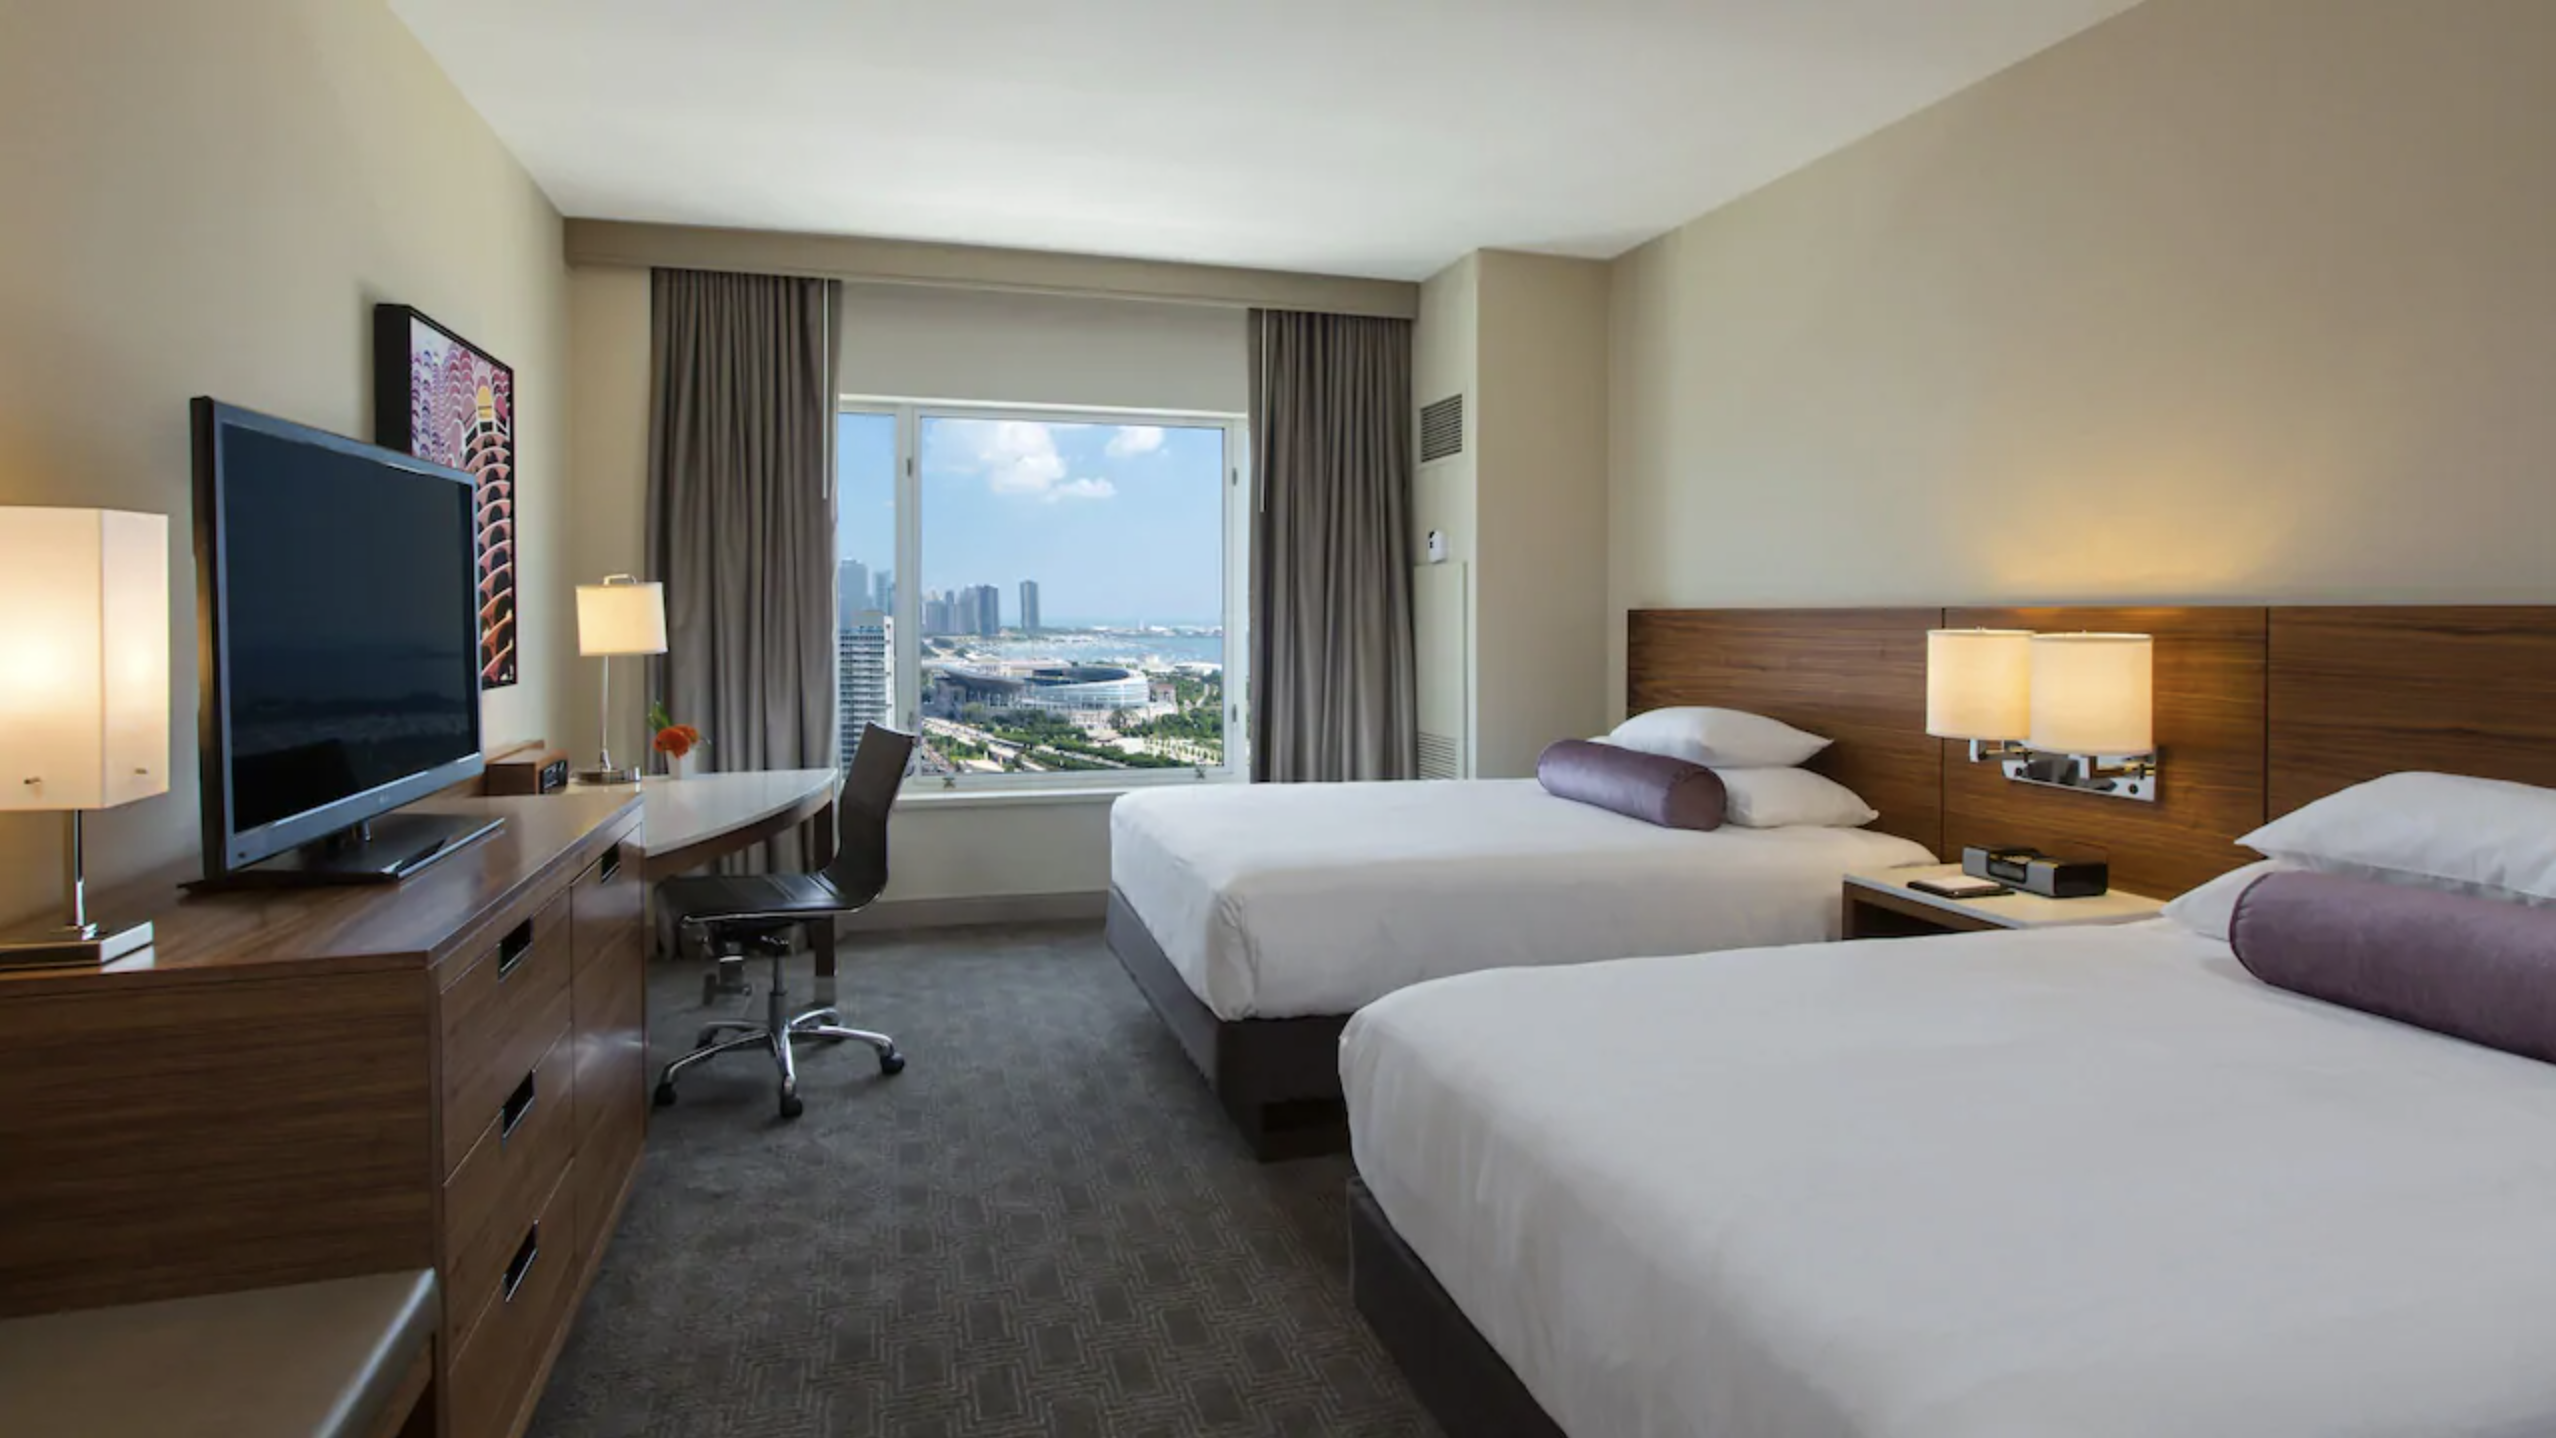 https://www.hotelsbyday.com/_data/default-hotel_image/4/23622/screen-shot-2020-11-06-at-8-28-09-pm.png